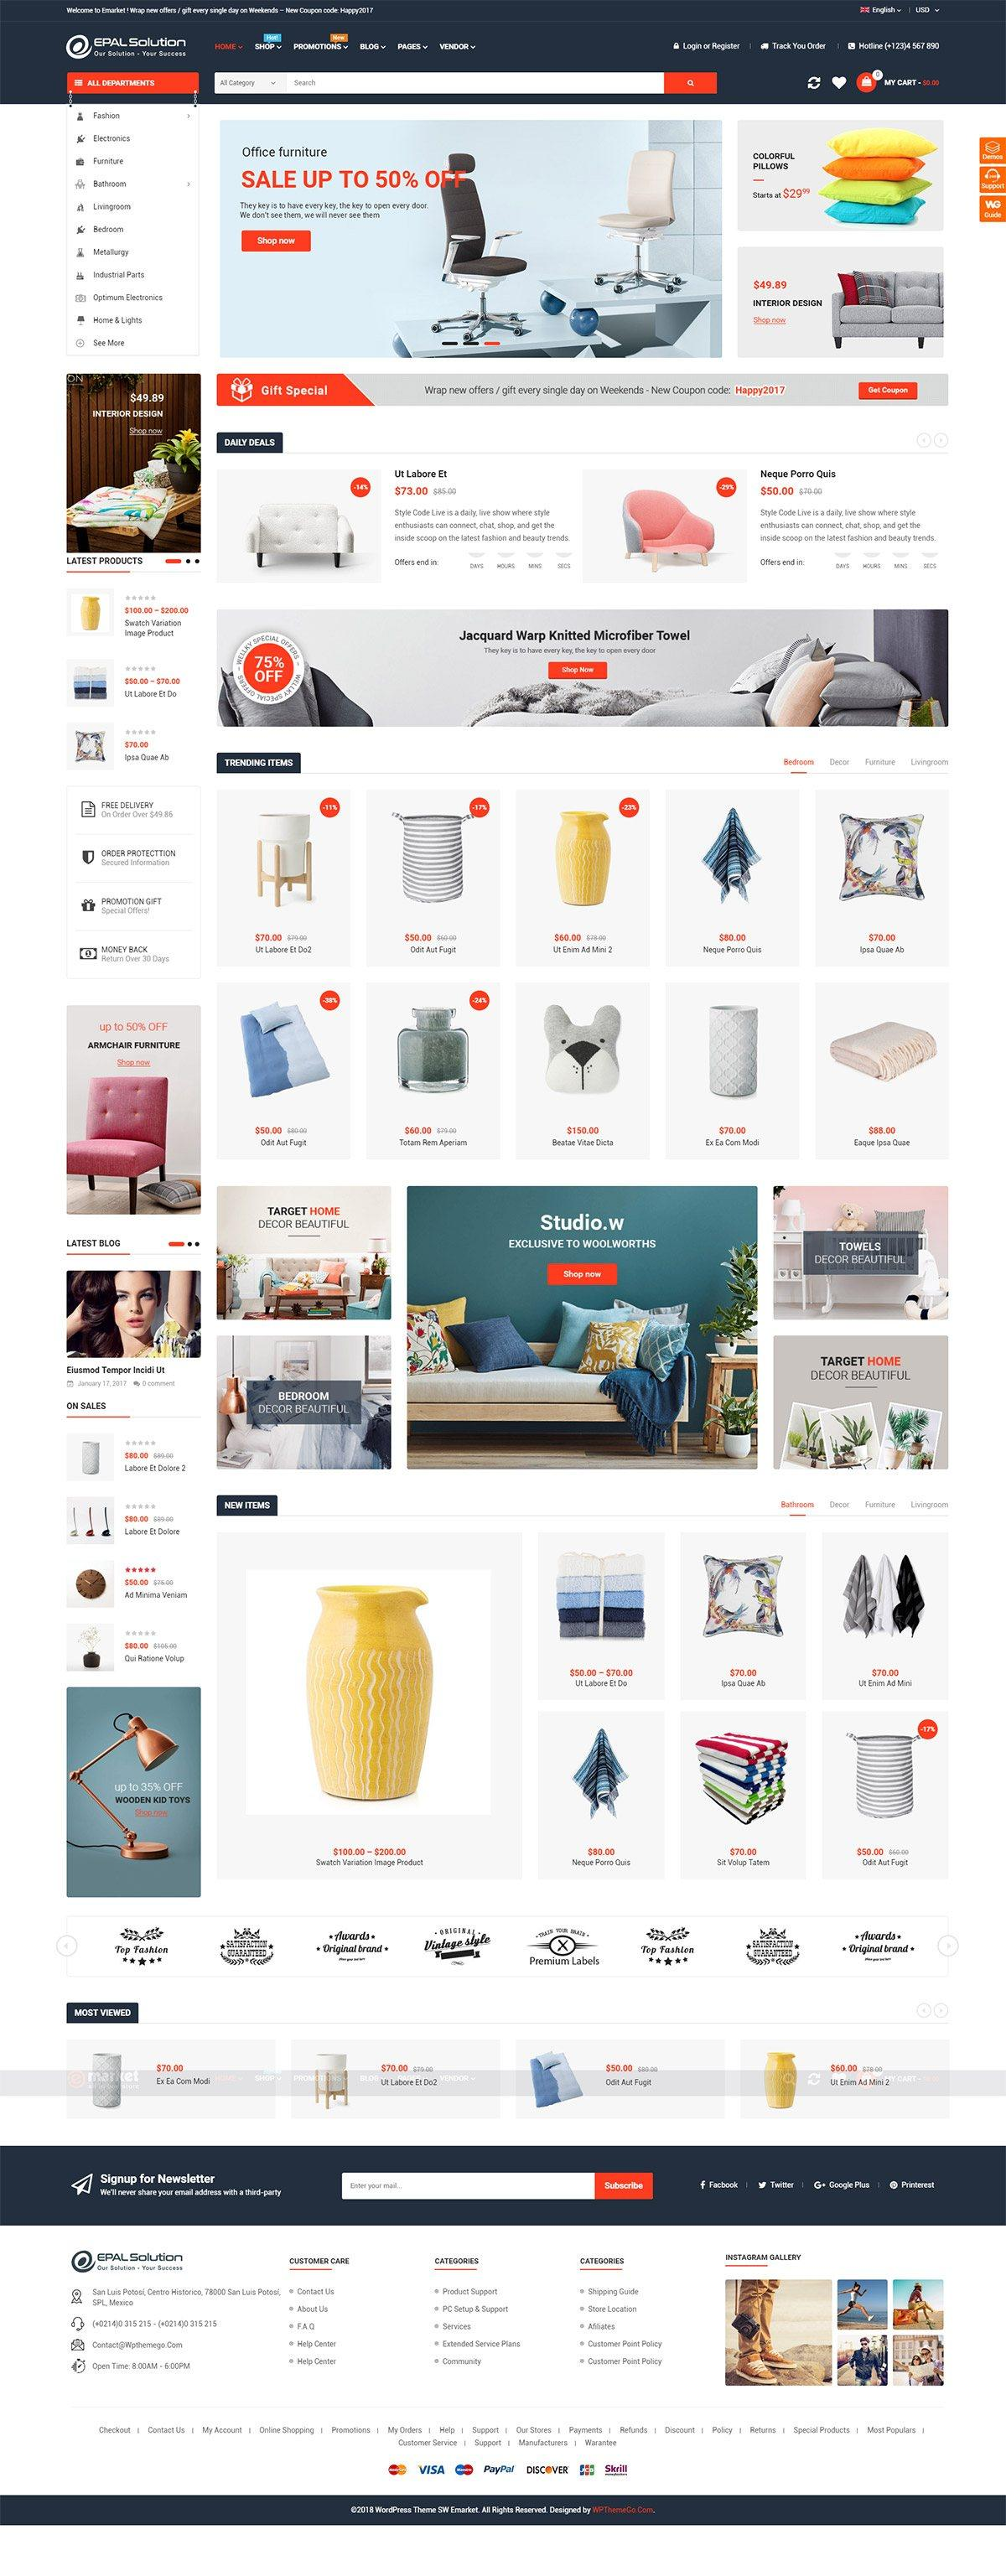 Giao-dien-website-thuong-mai-dien-tu-e-market